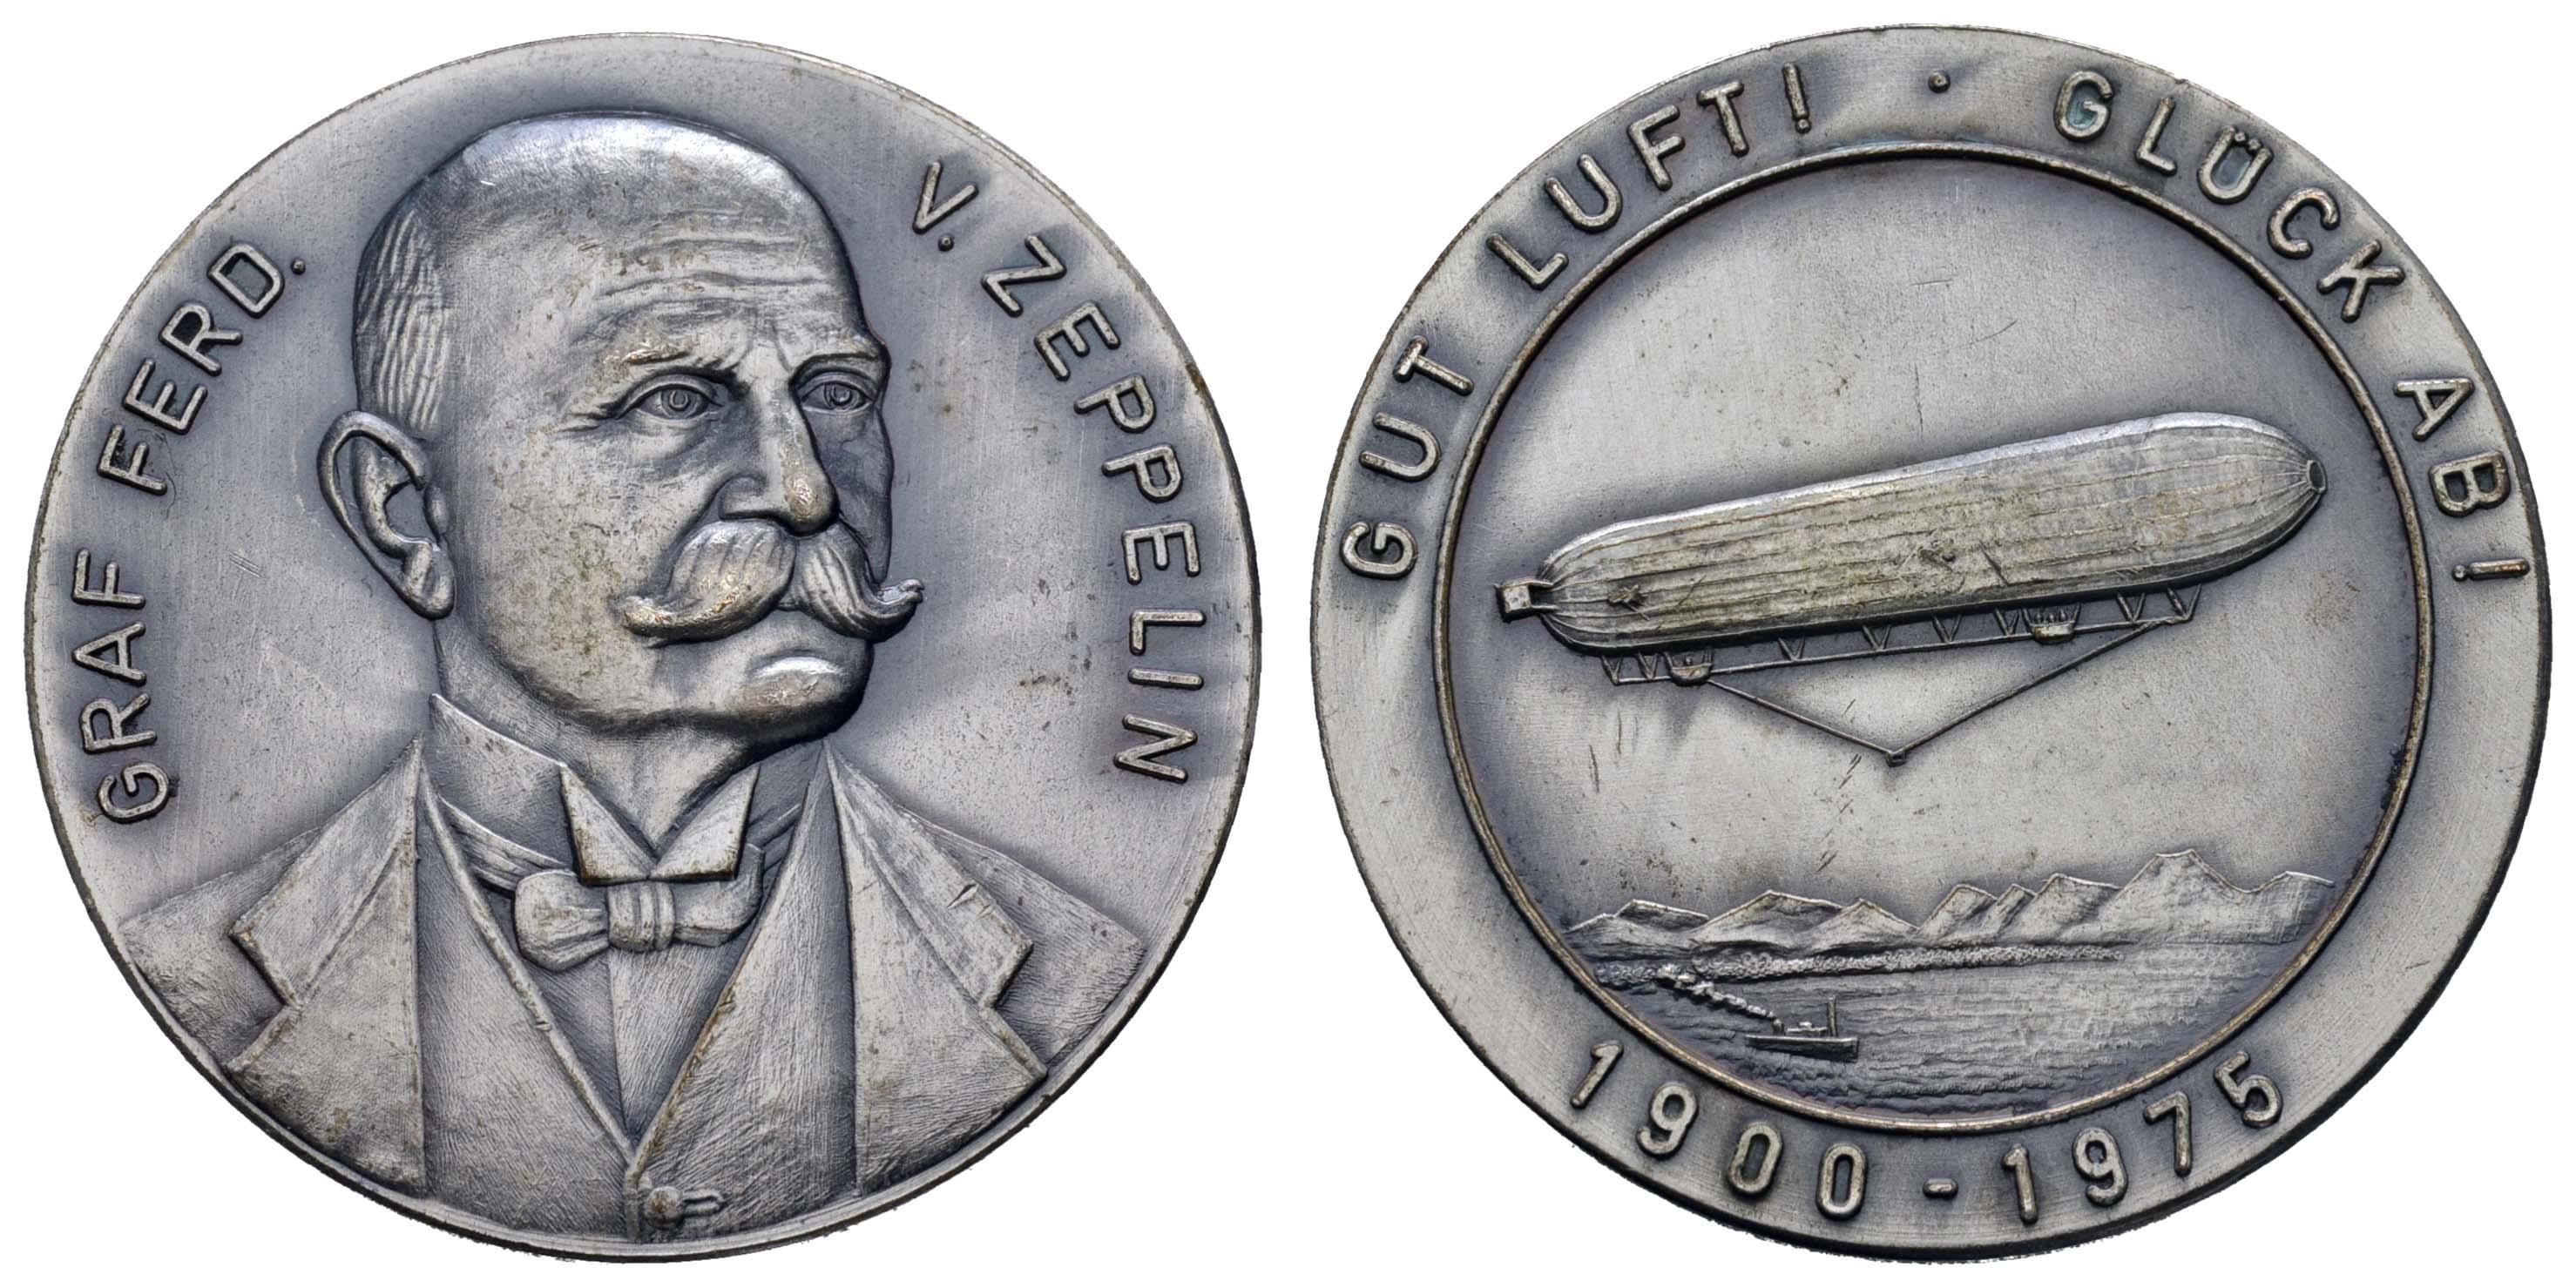 Lot 2350 - medaillen Sonstige Medaillen - Zeppelin -  Auktionshaus Ulrich Felzmann GmbH & Co. KG Coins single lots